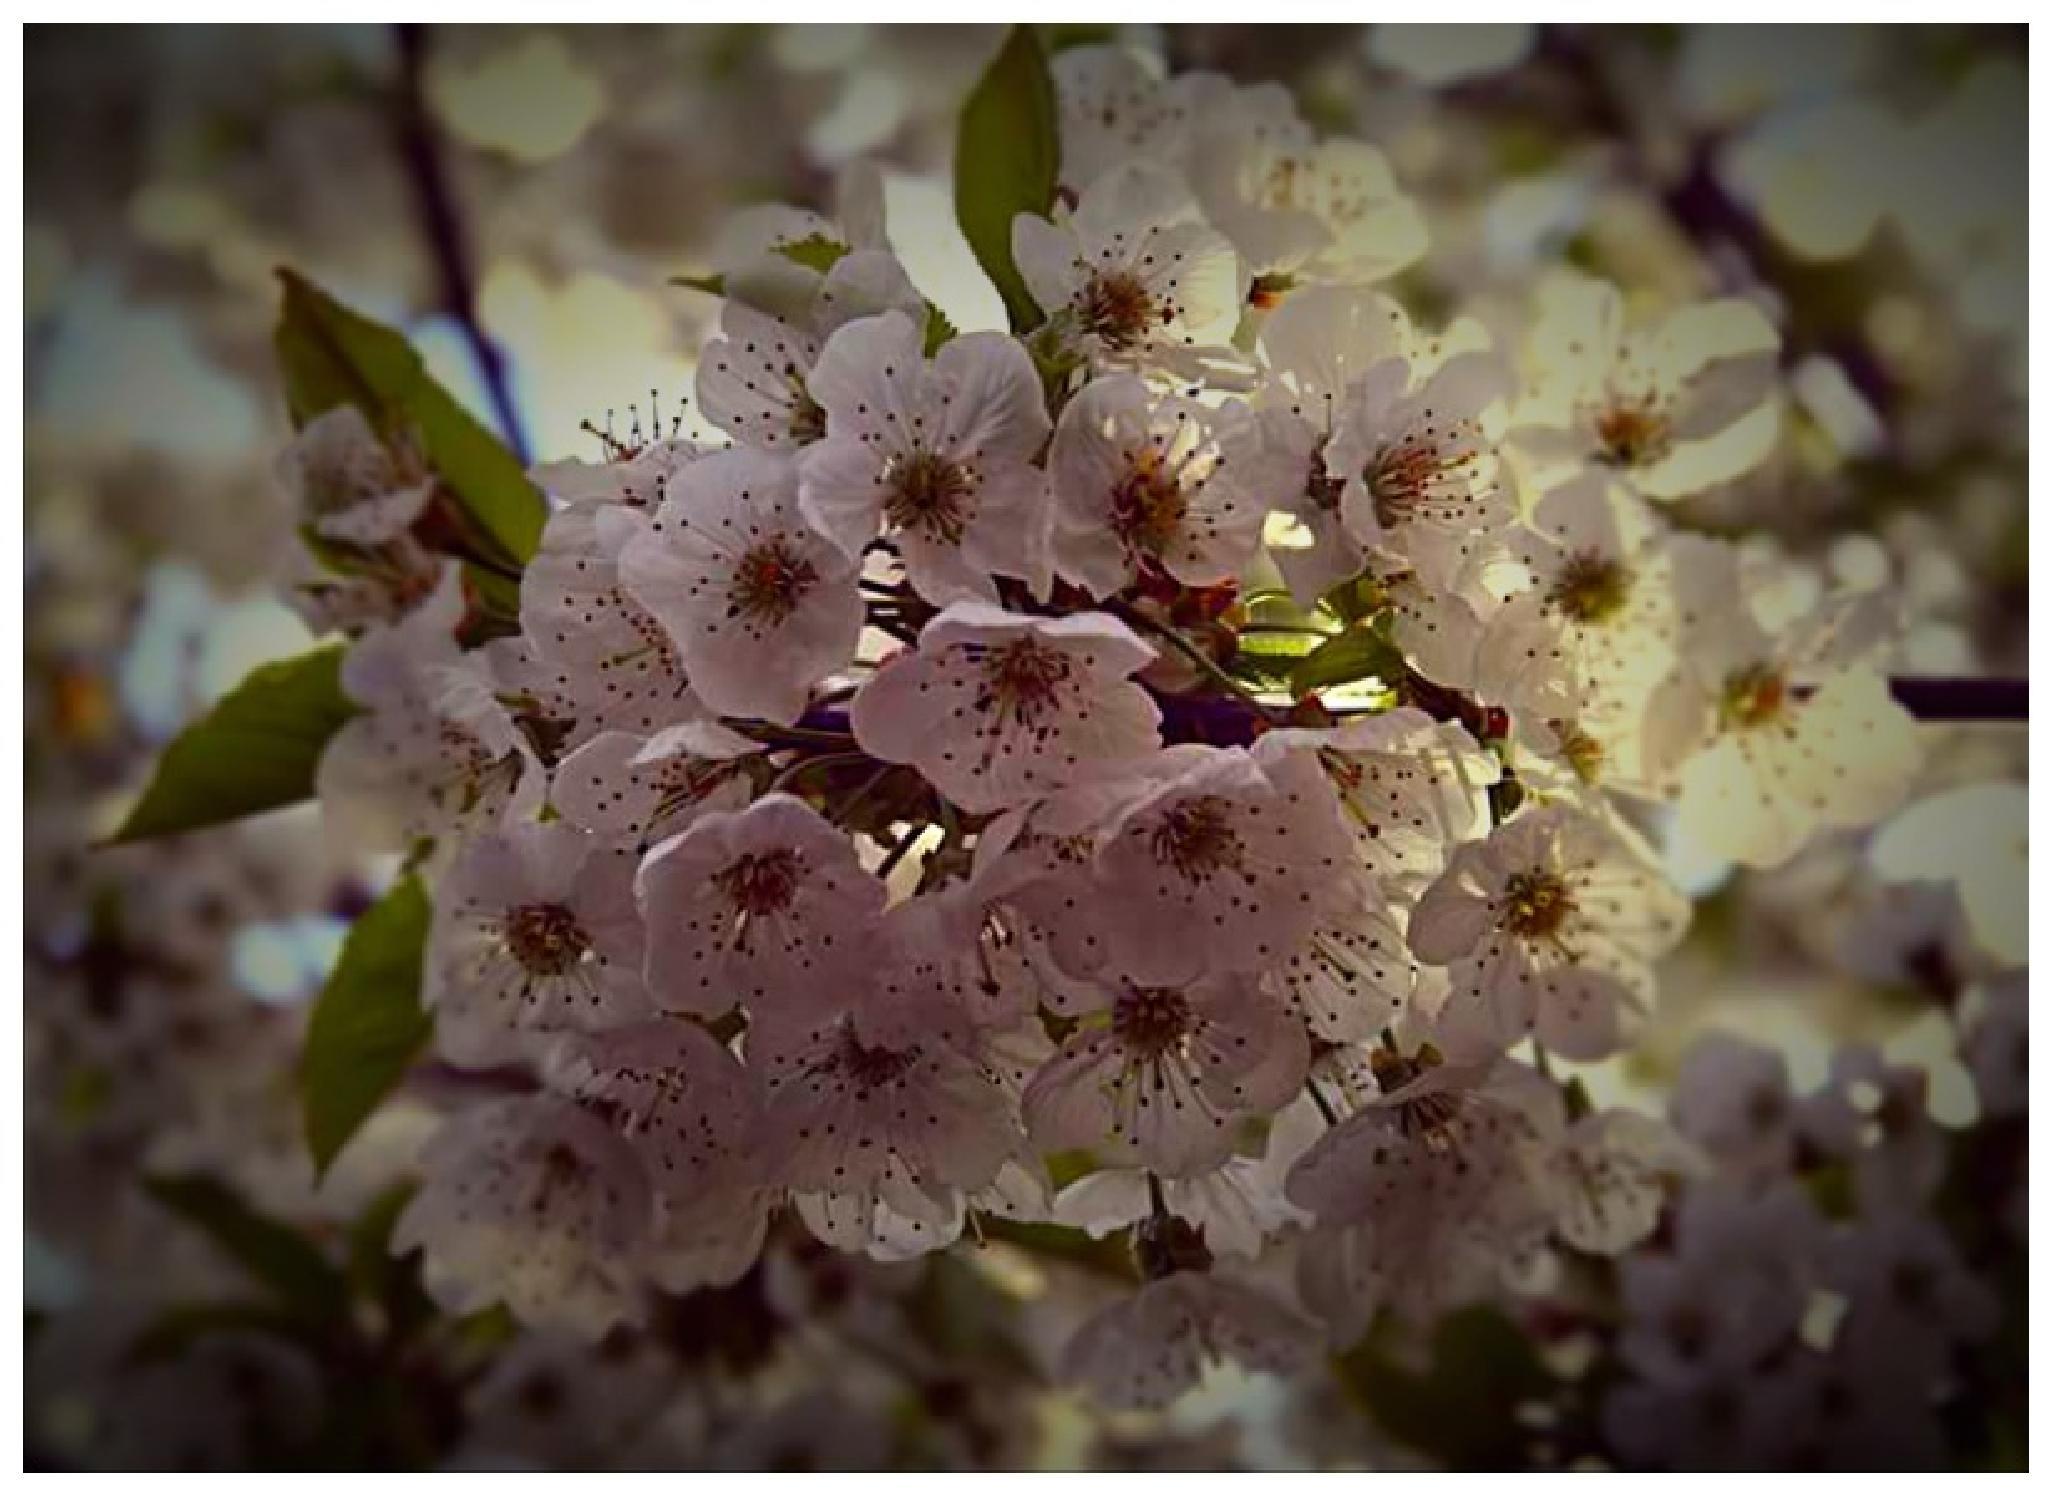 Beautiful blossom  by audrey.verhoevenernst